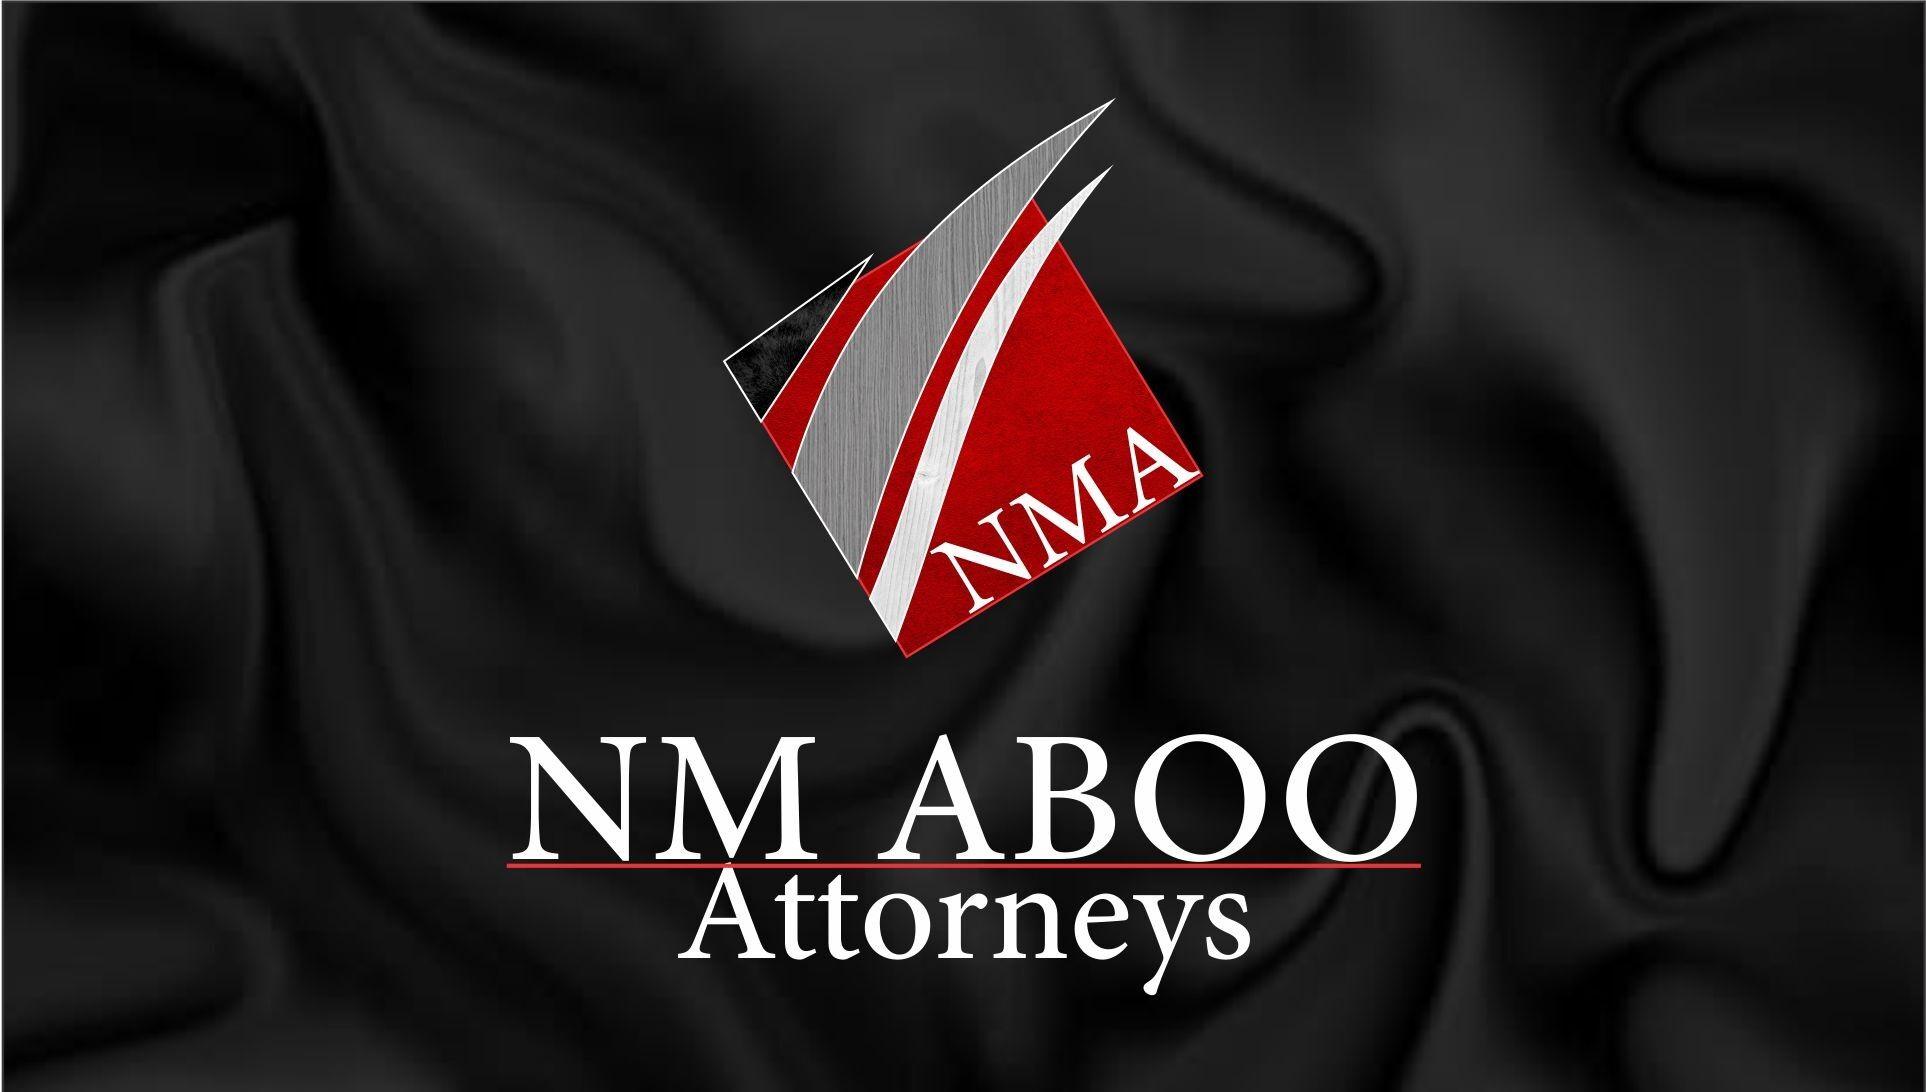 NM Aboo Attorneys